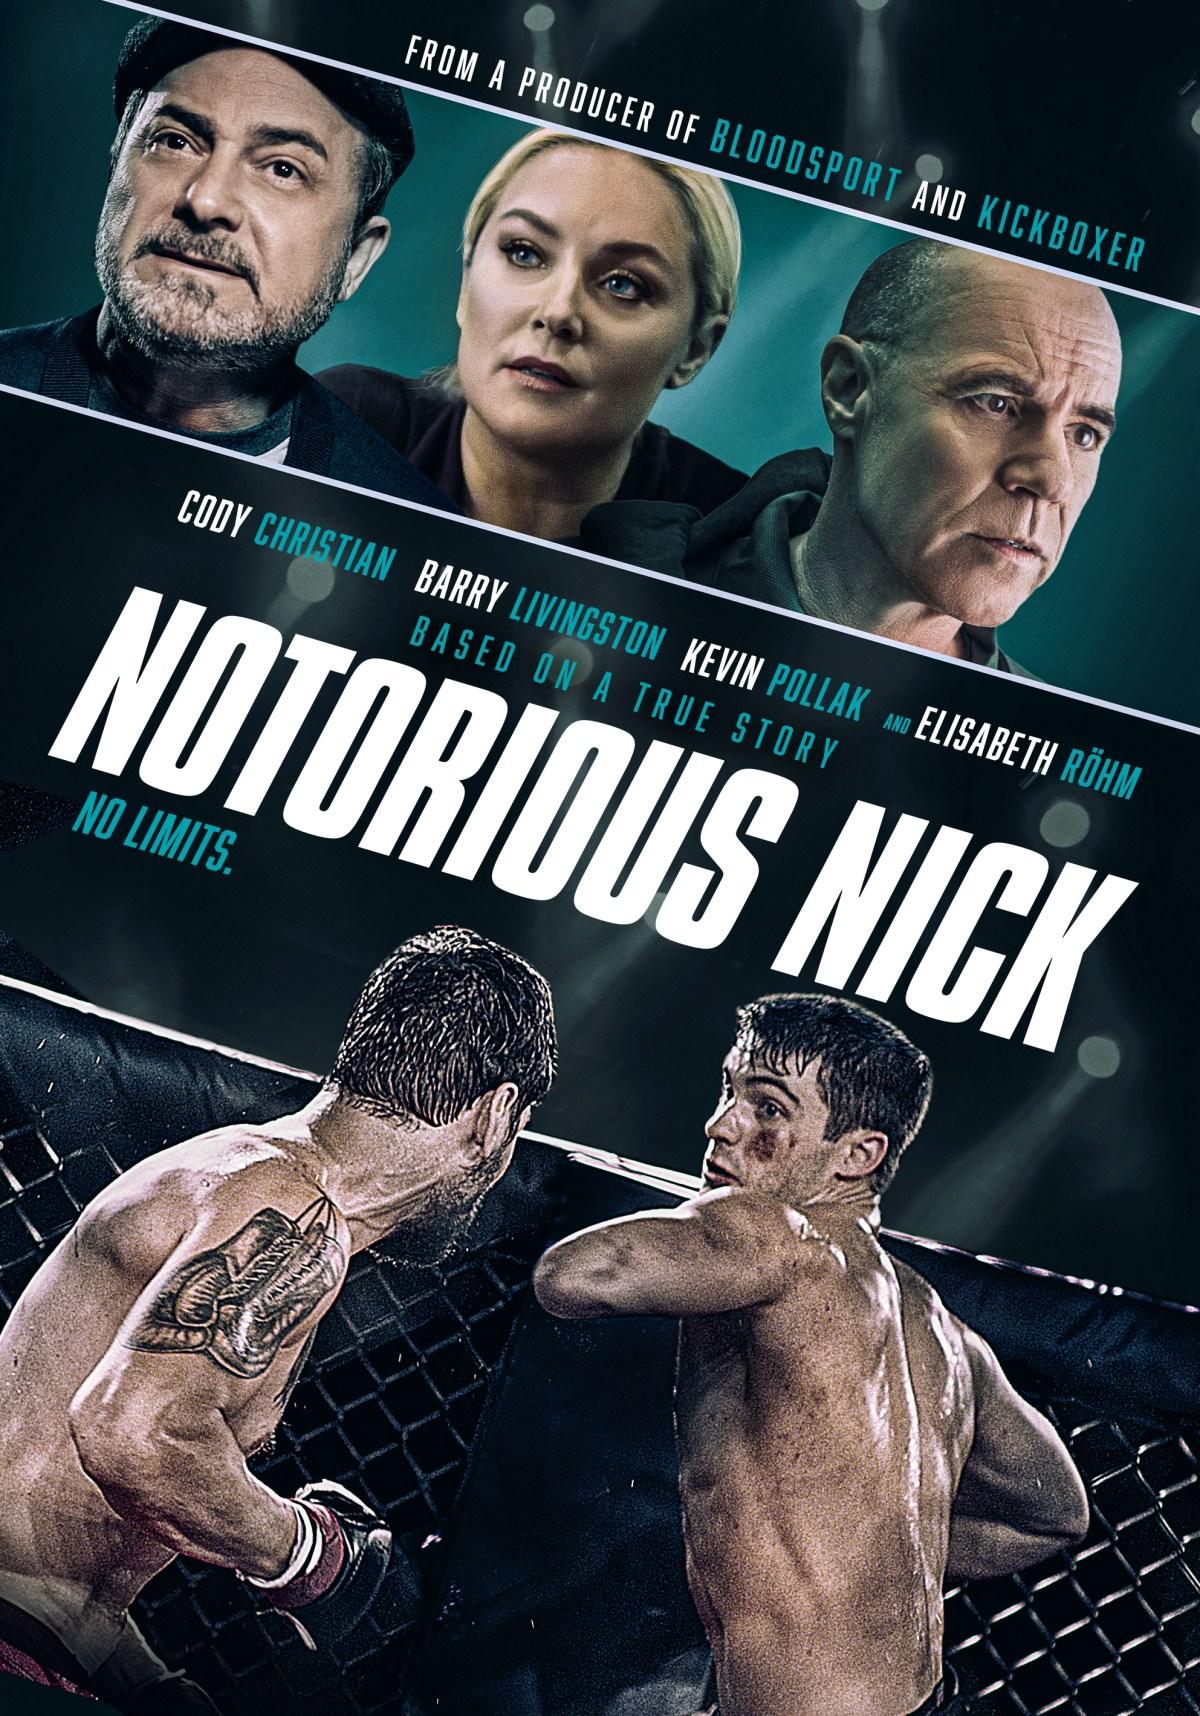 Notorious Nick Newell Movie